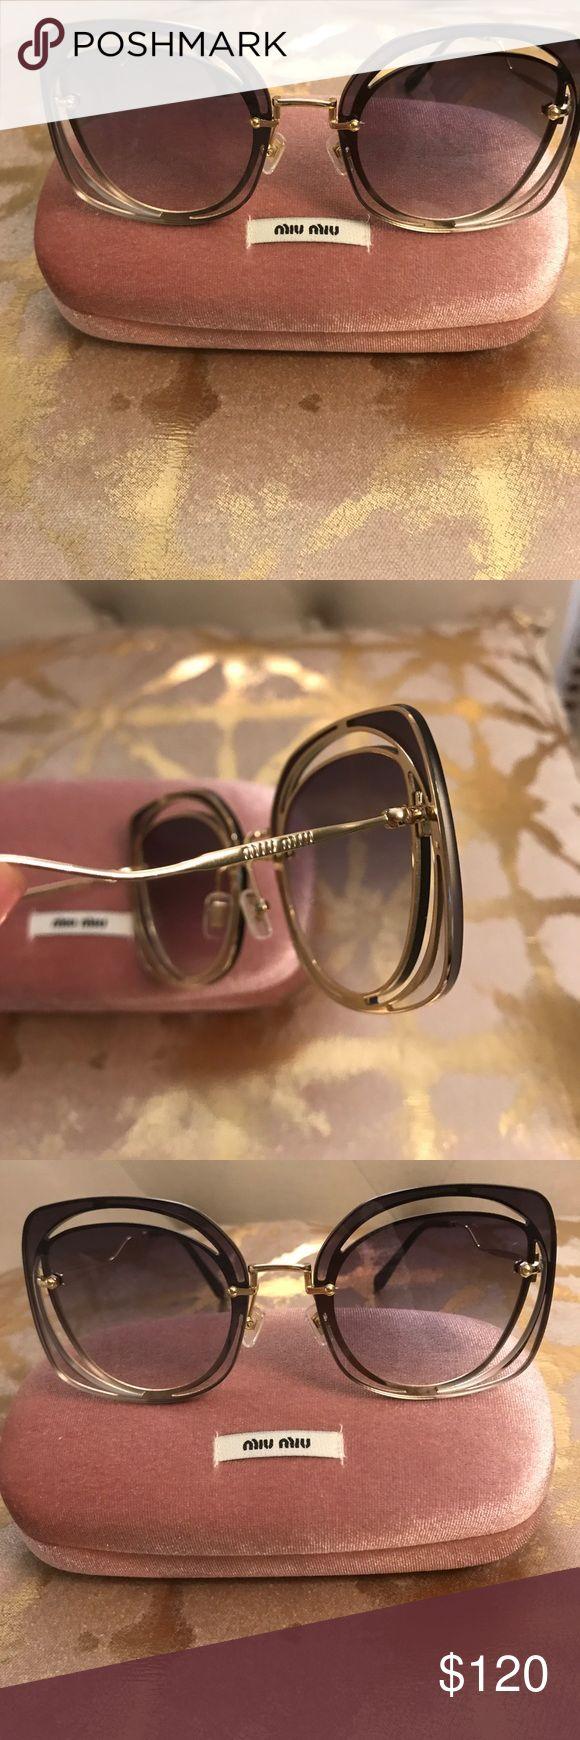 Frameless Glasses Lenscrafters : 25+ best ideas about Miu miu glasses on Pinterest ...